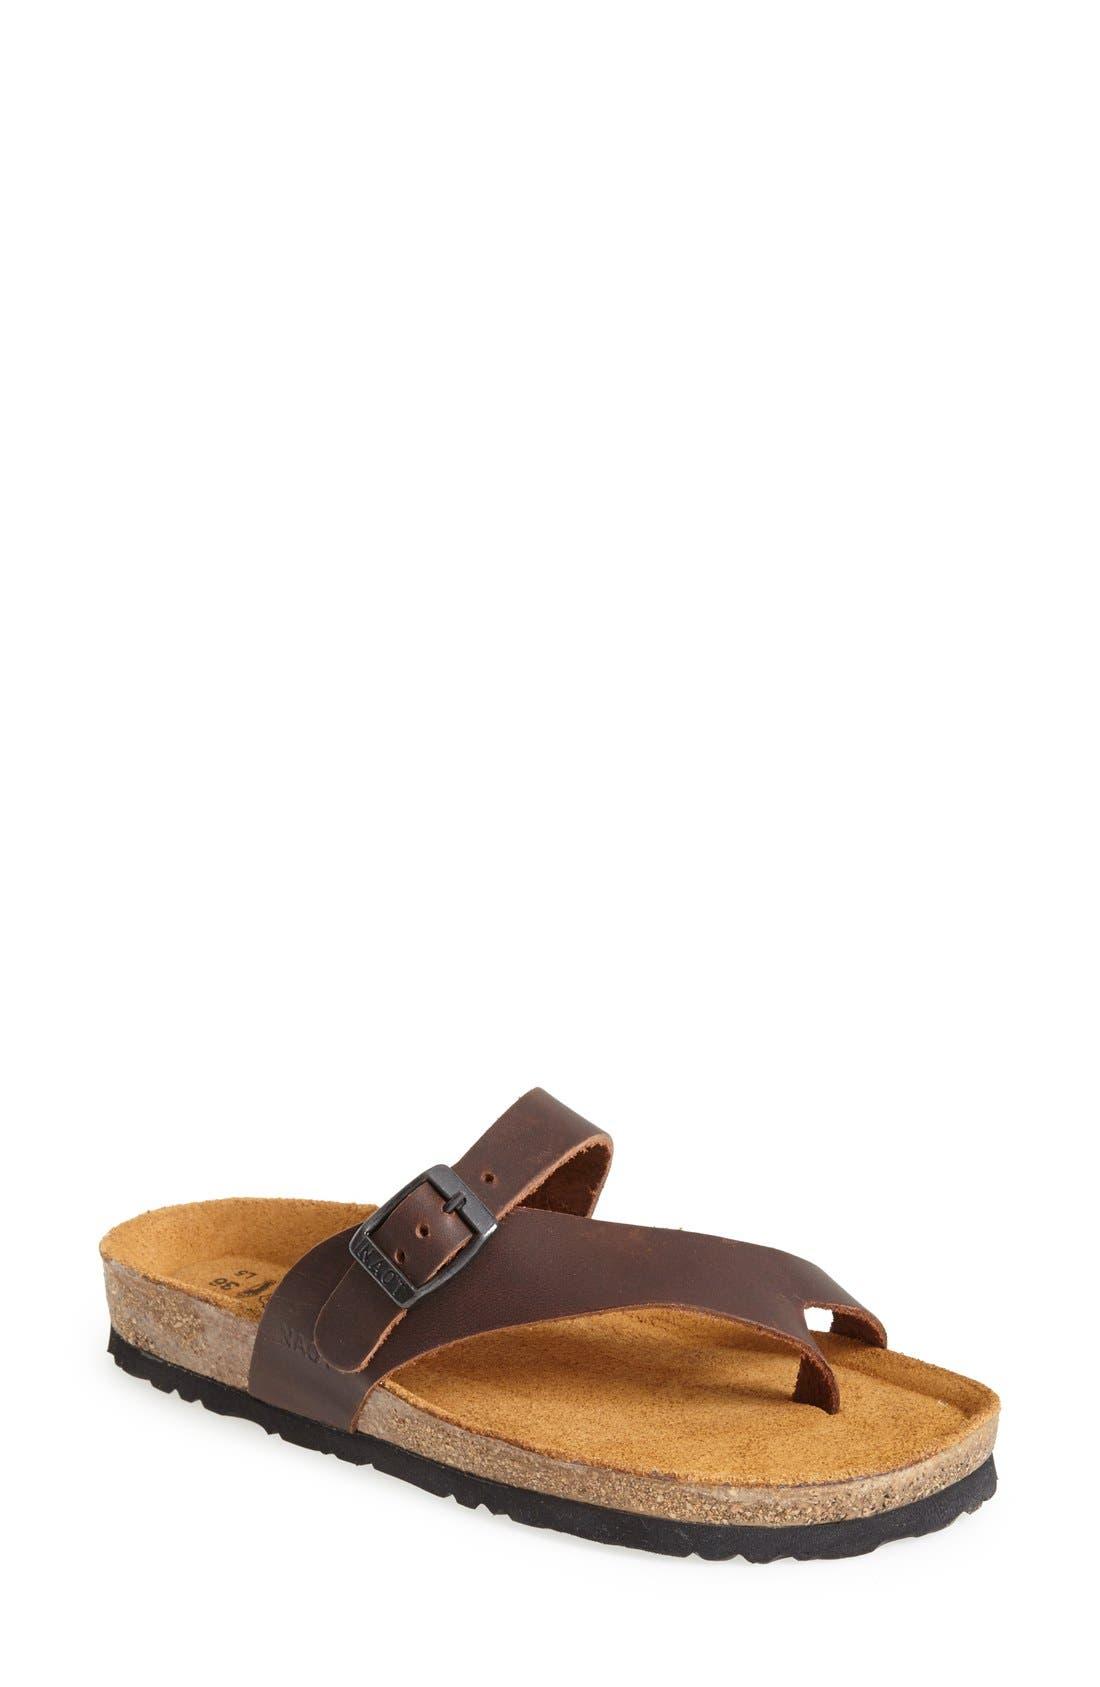 Alternate Image 1 Selected - Naot 'Tahoe' Sandal (Women)